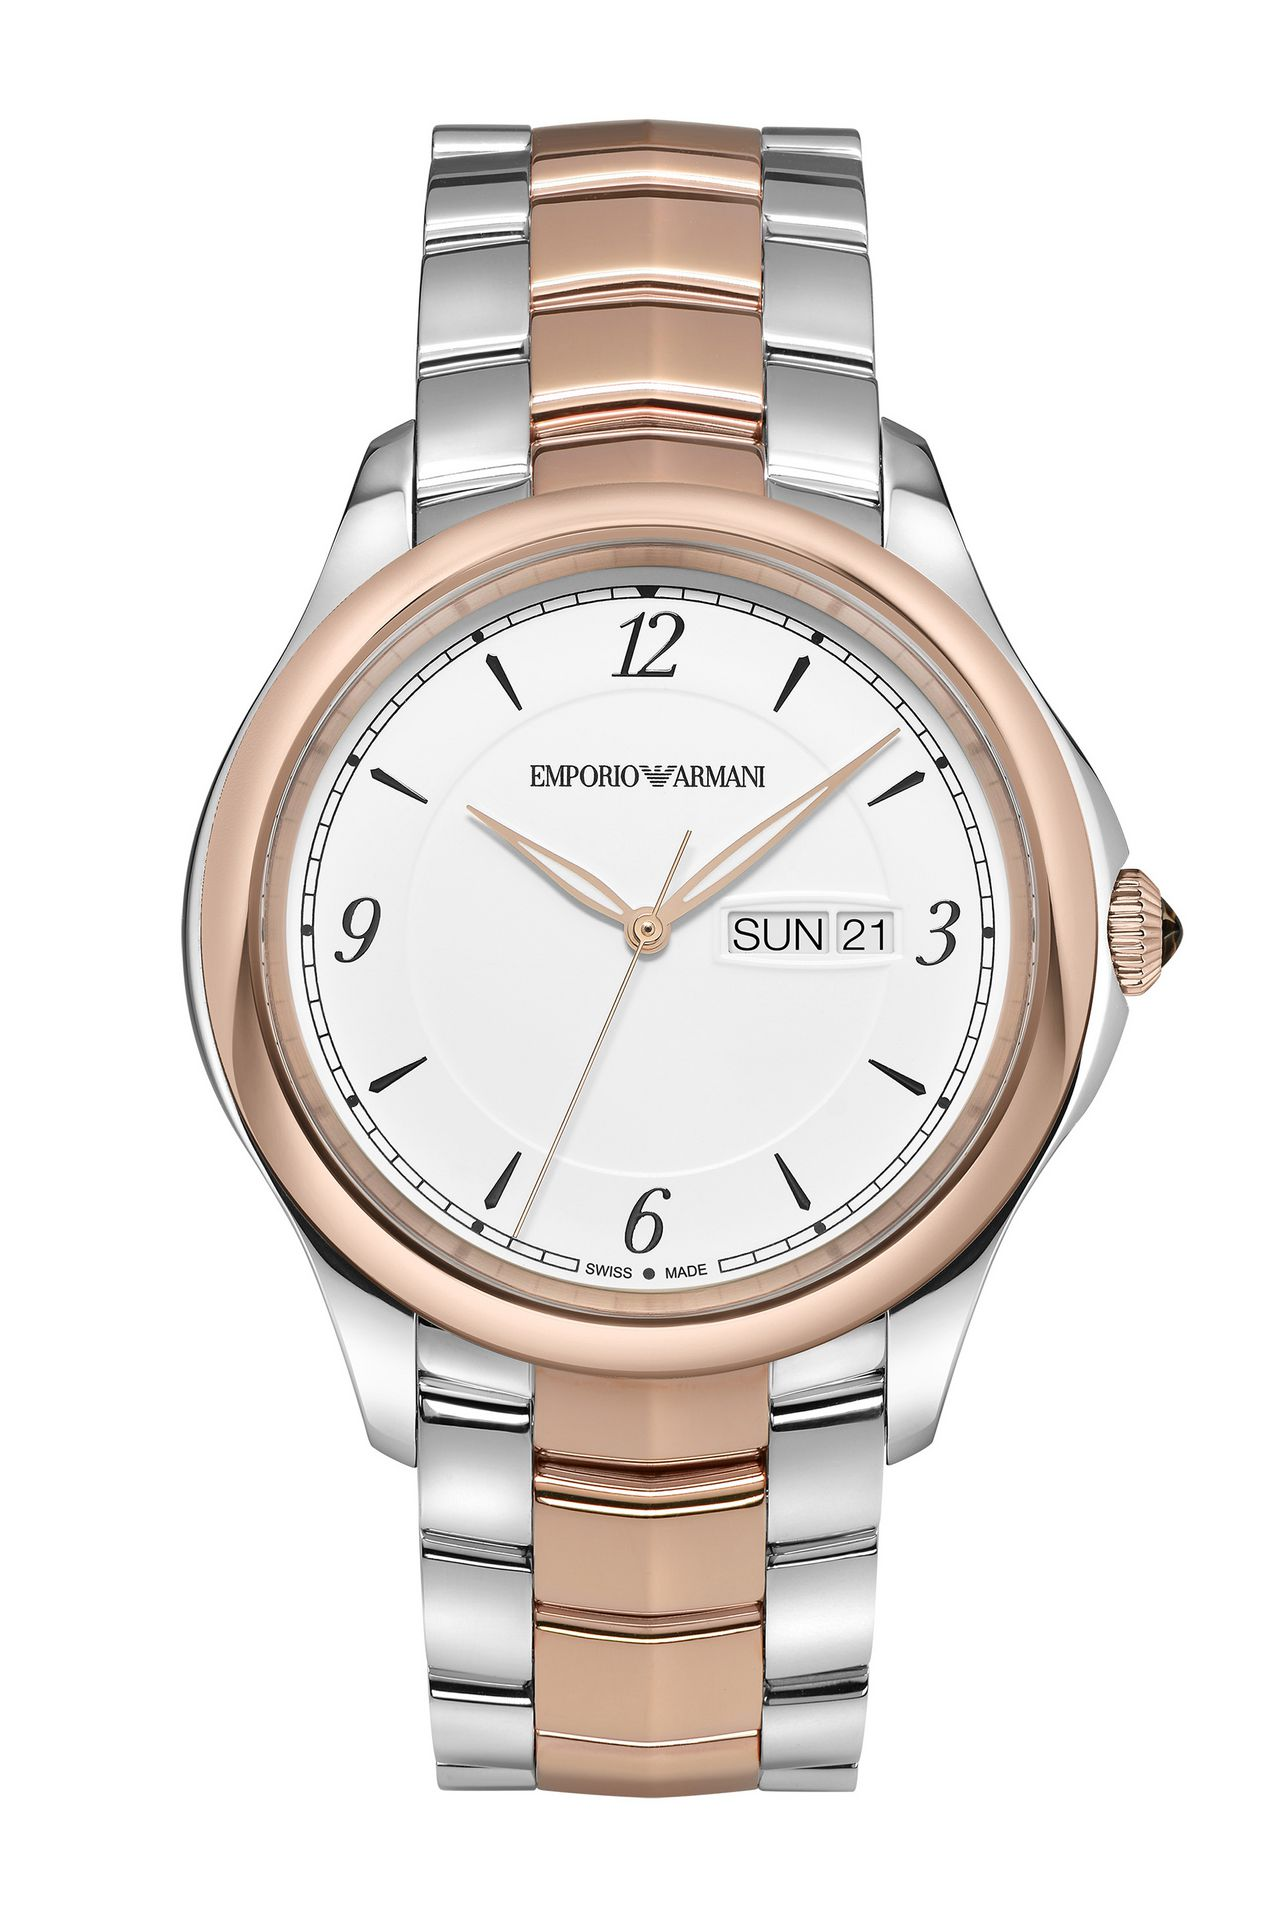 emporio armani men s watches swiss smartwatches quartz armani swiss made watches men swiss made watches